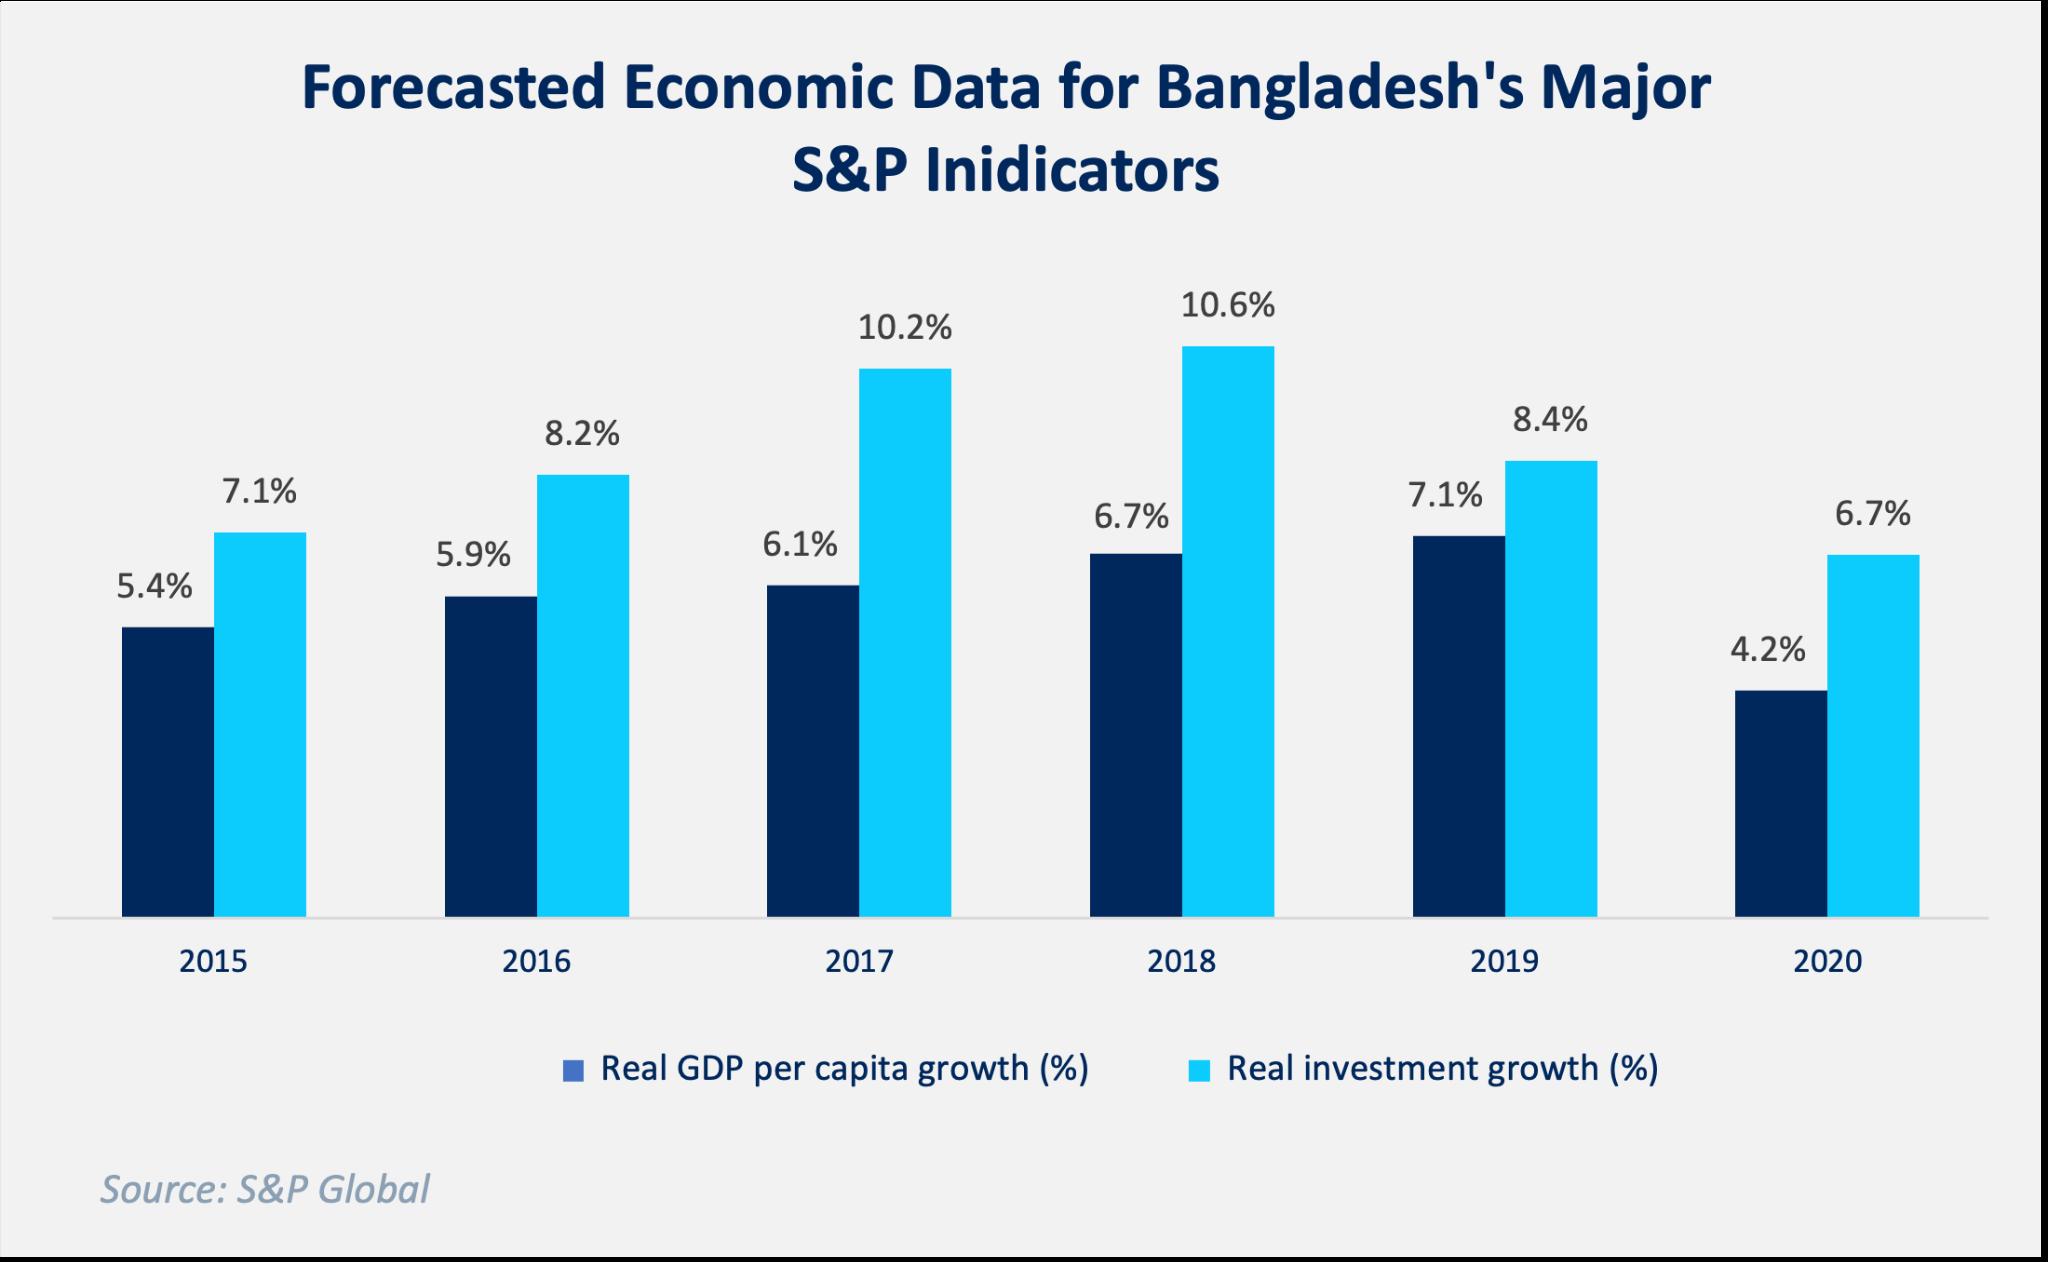 Figure: Forecasted Economic Data as per S&P Global_LightCastle Partners